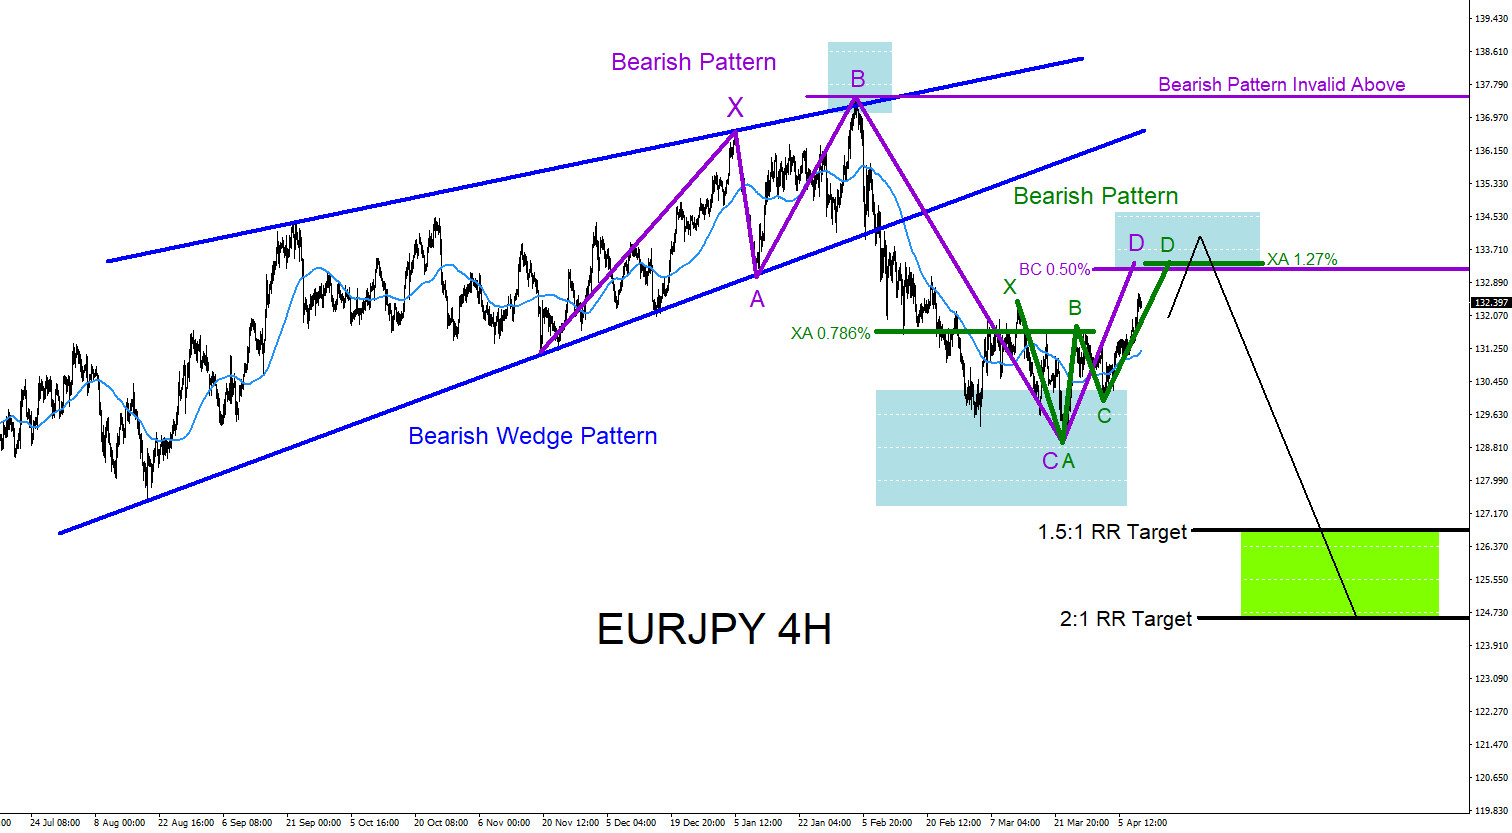 EURJPY : Possible Bearish Scenarios